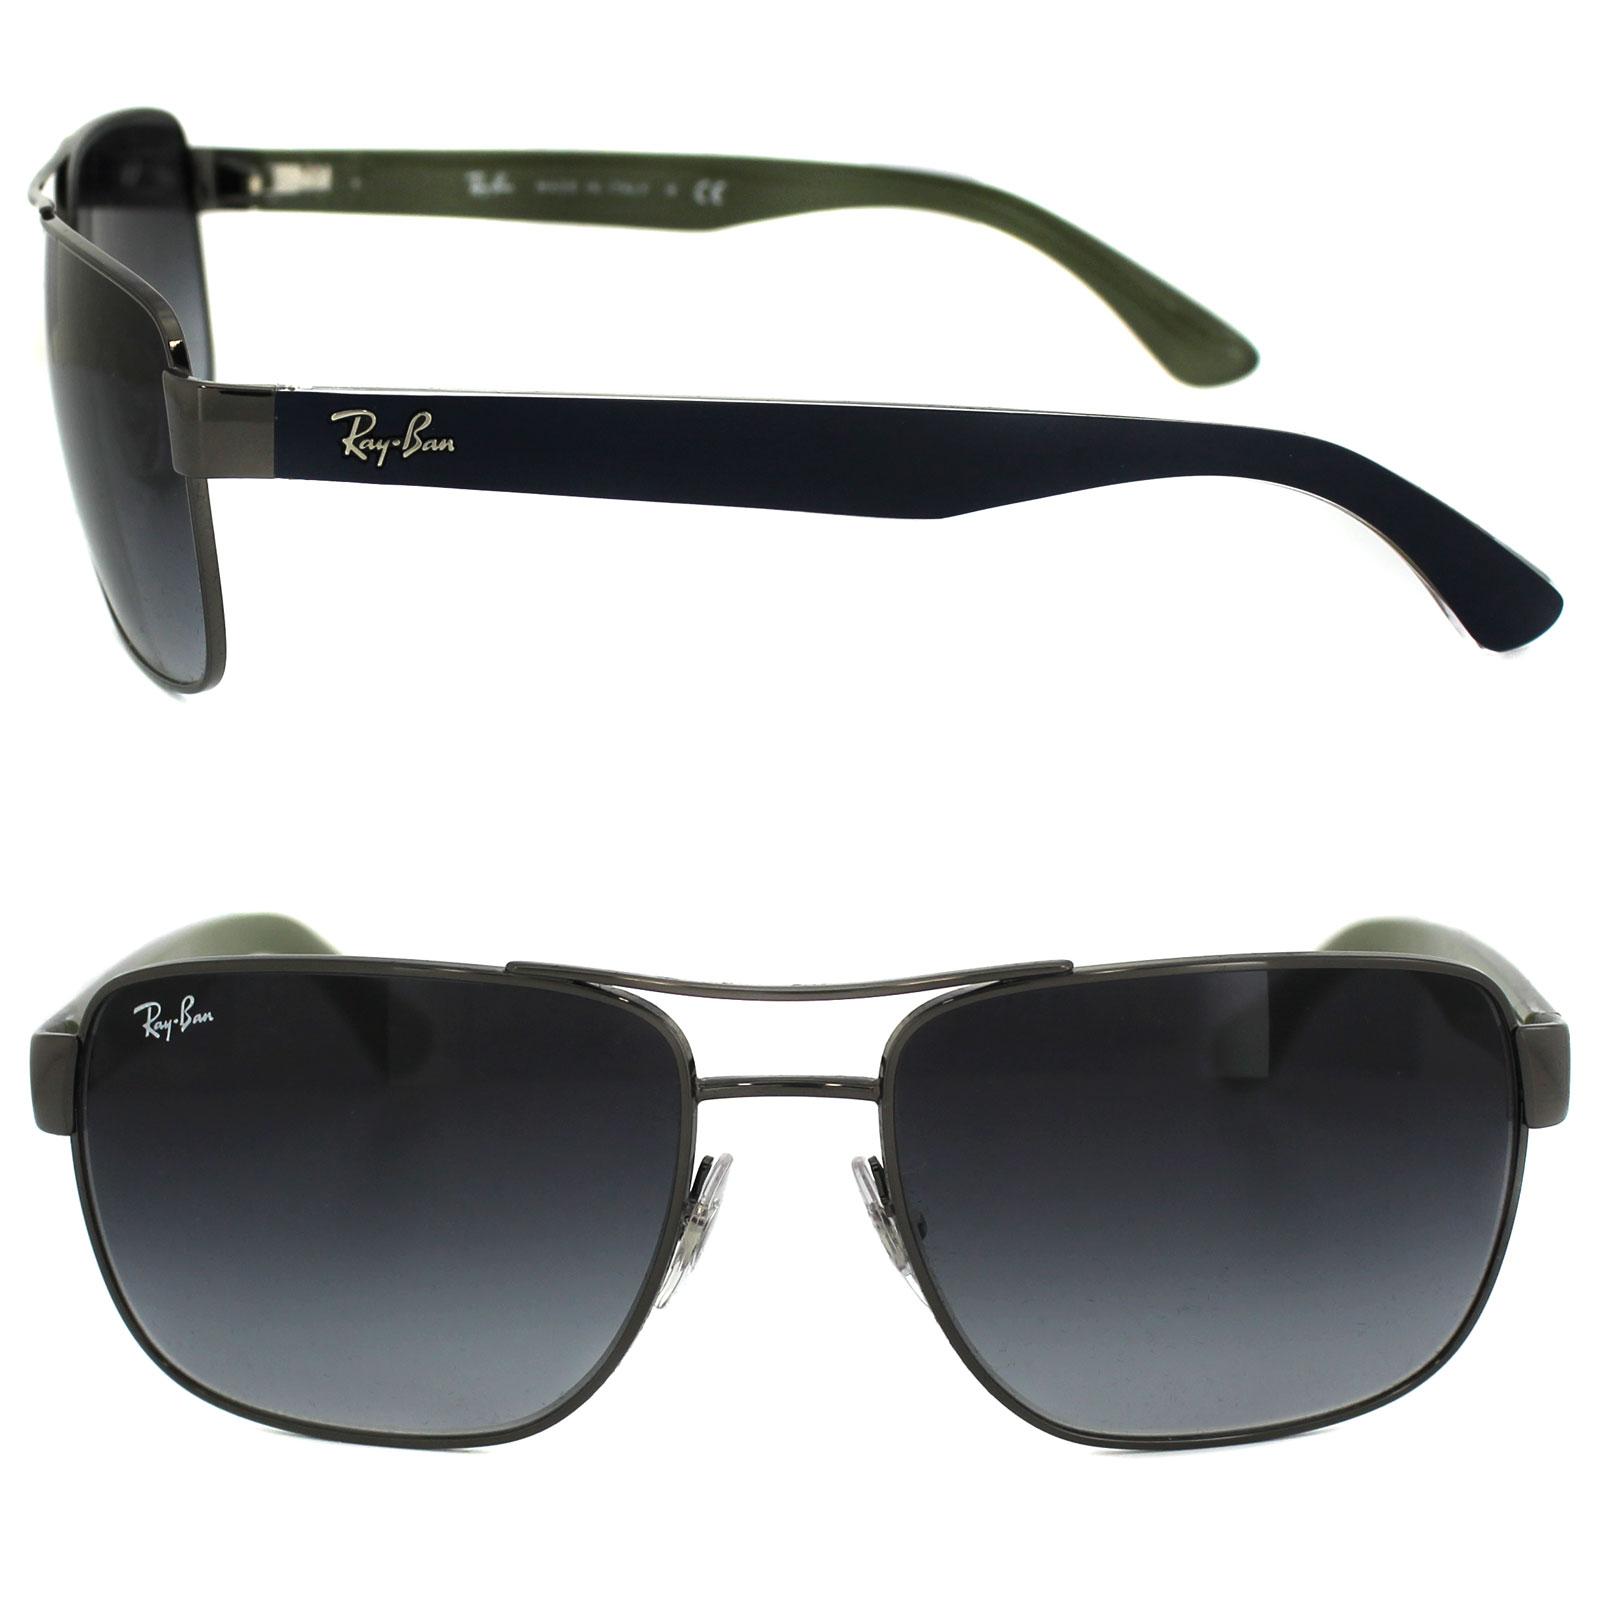 cdfec8a96b8 Sentinel Ray-Ban Sunglasses 3530 004 8G Gunmetal   Blue Grey Gradient